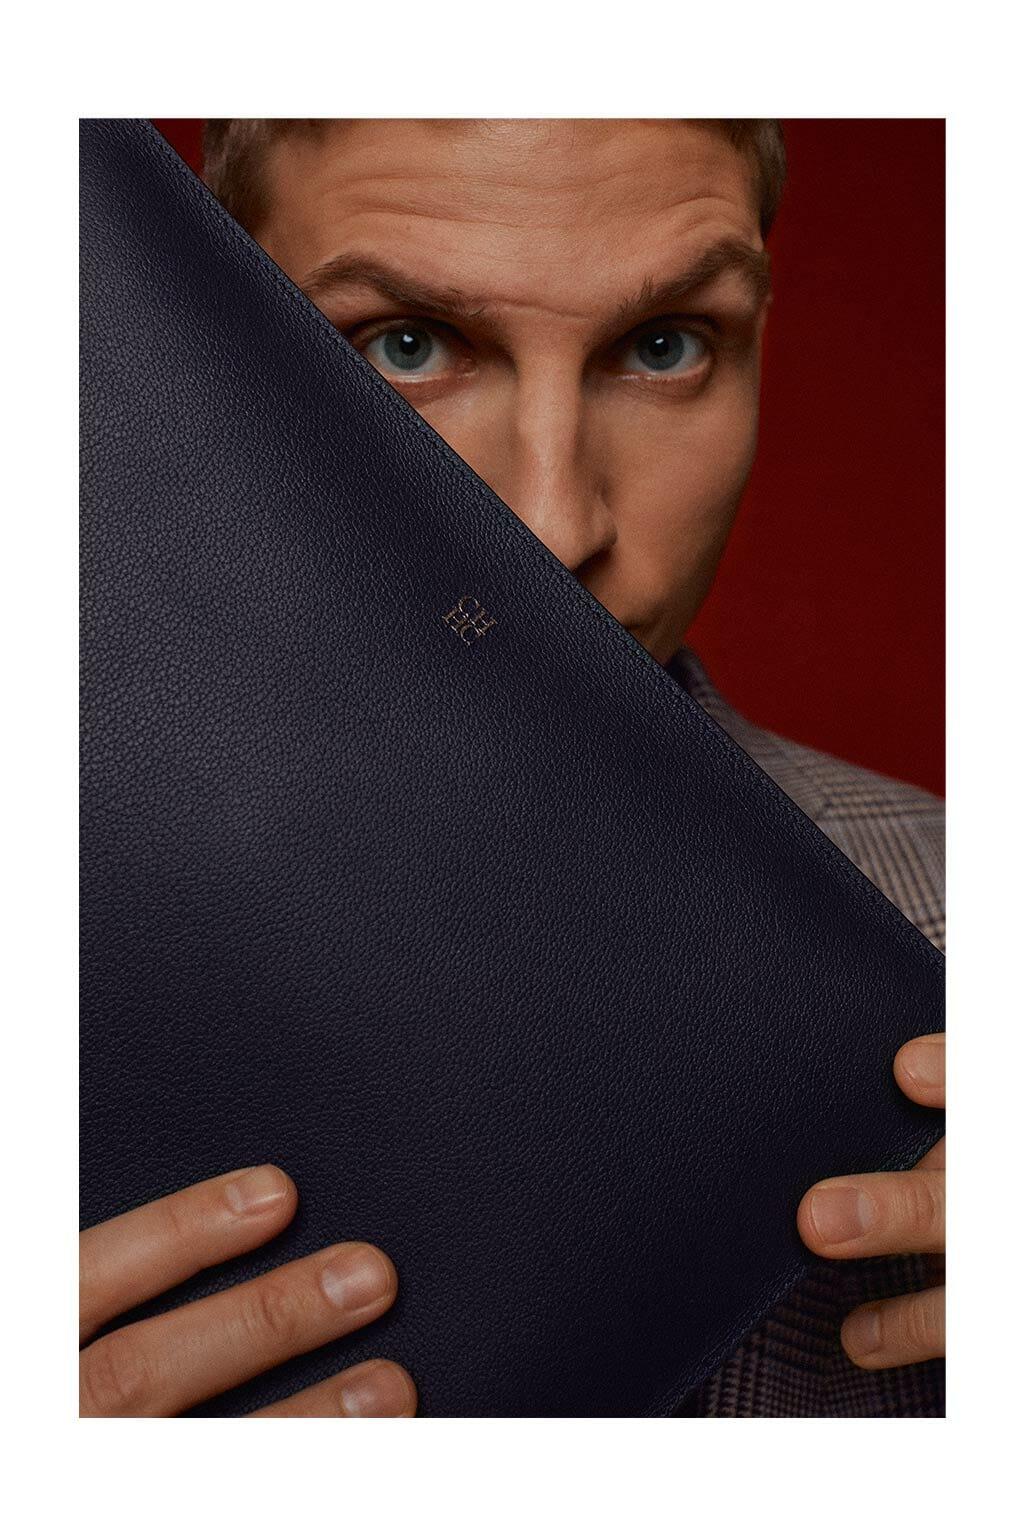 CH Carolina Herrera. New Menswear Collection Early Summer. Look 05